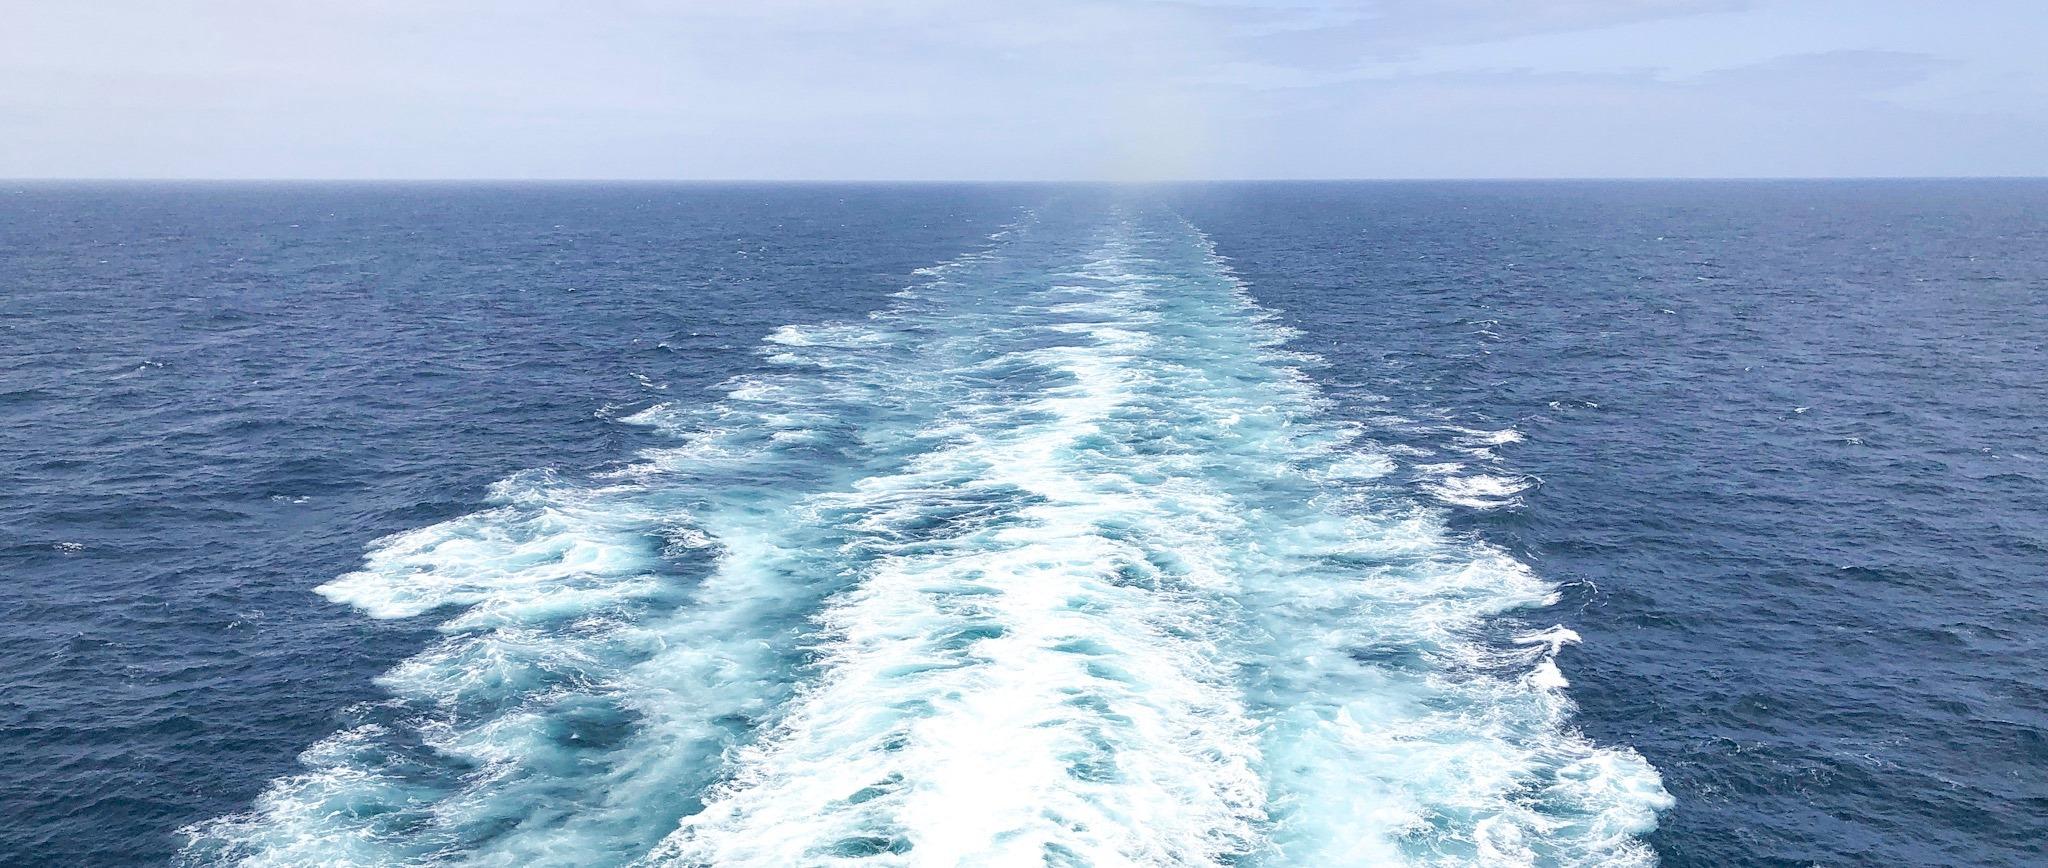 view of ship wake